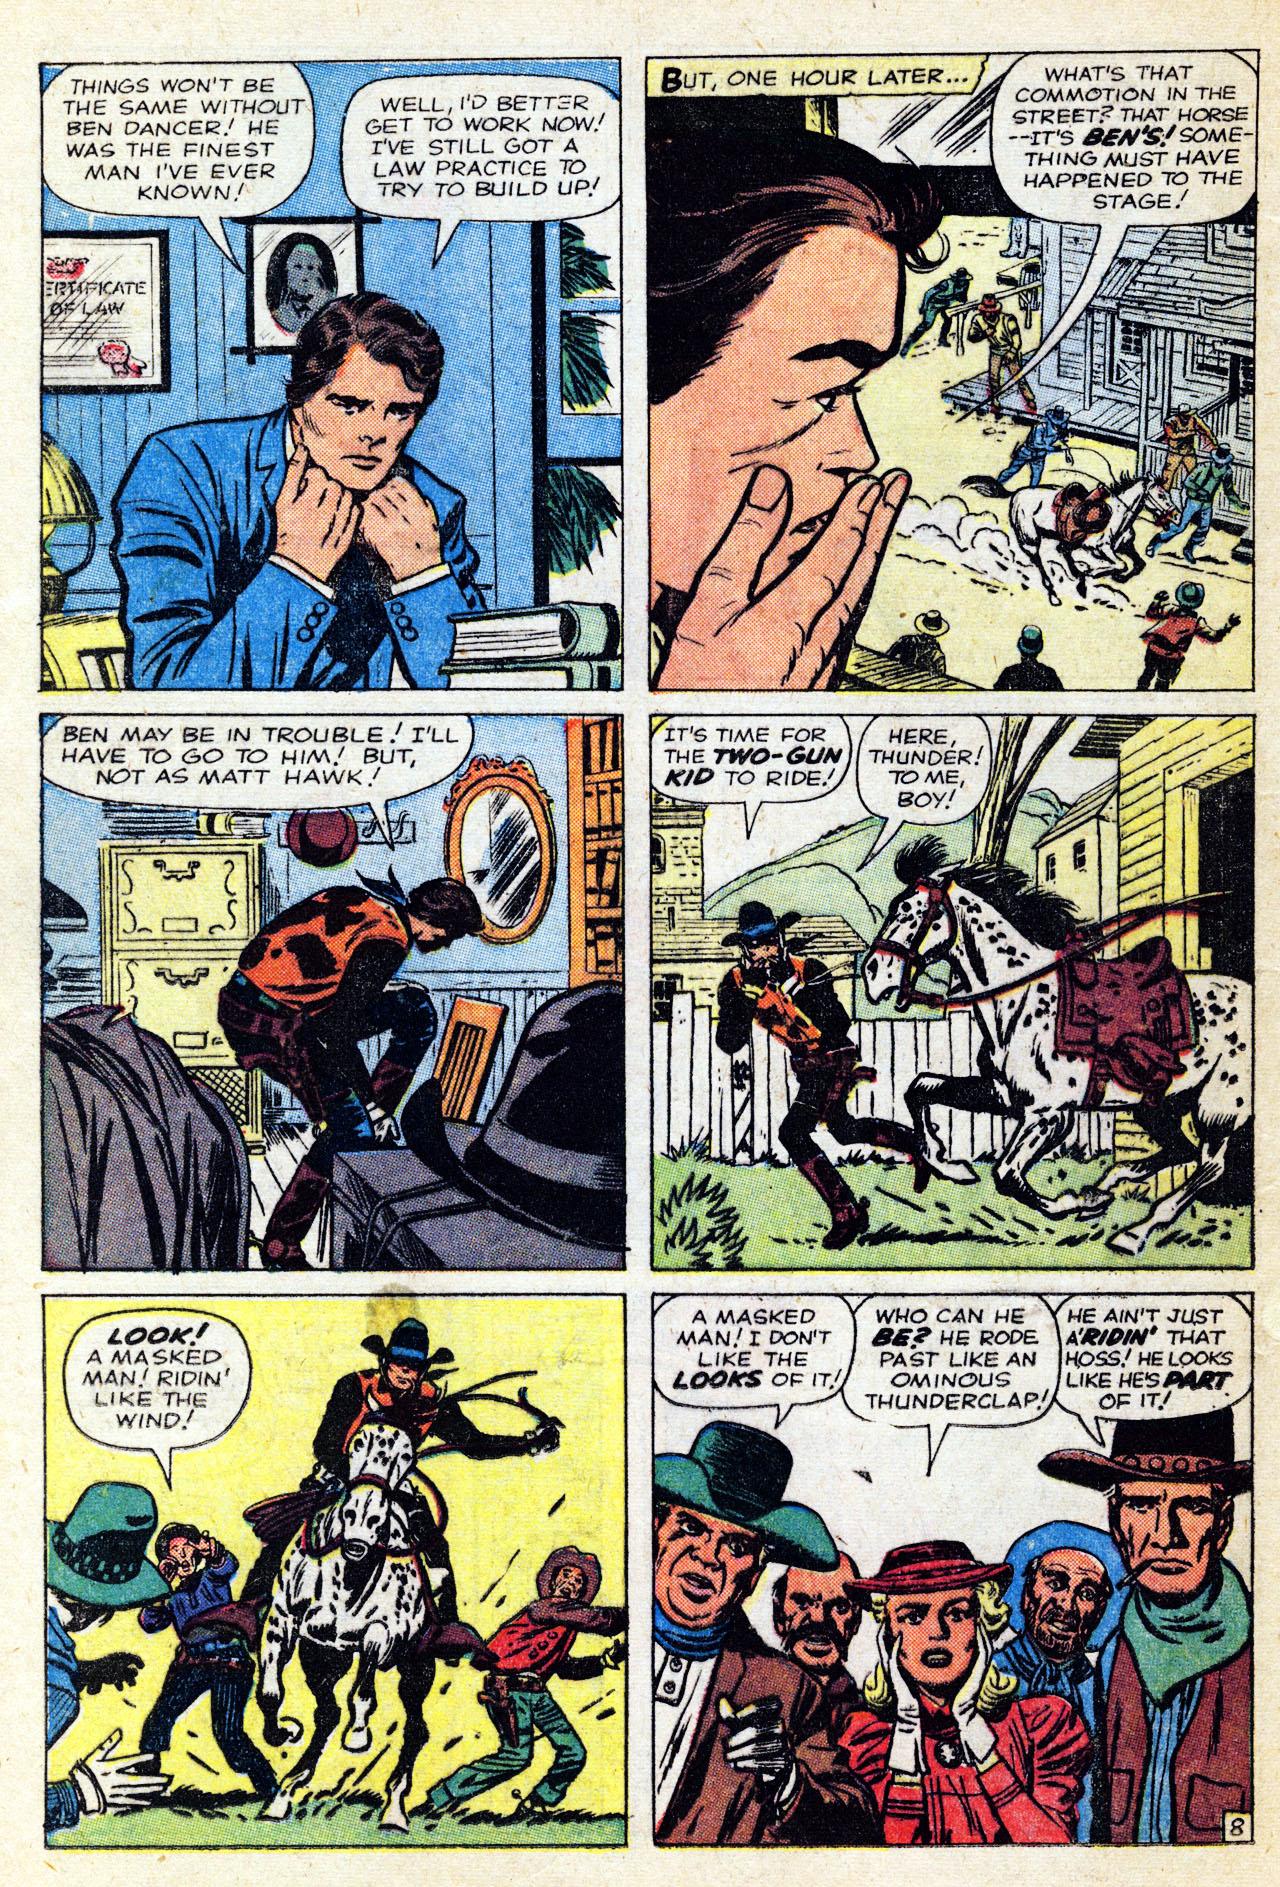 Read online Two-Gun Kid comic -  Issue #60 - 12